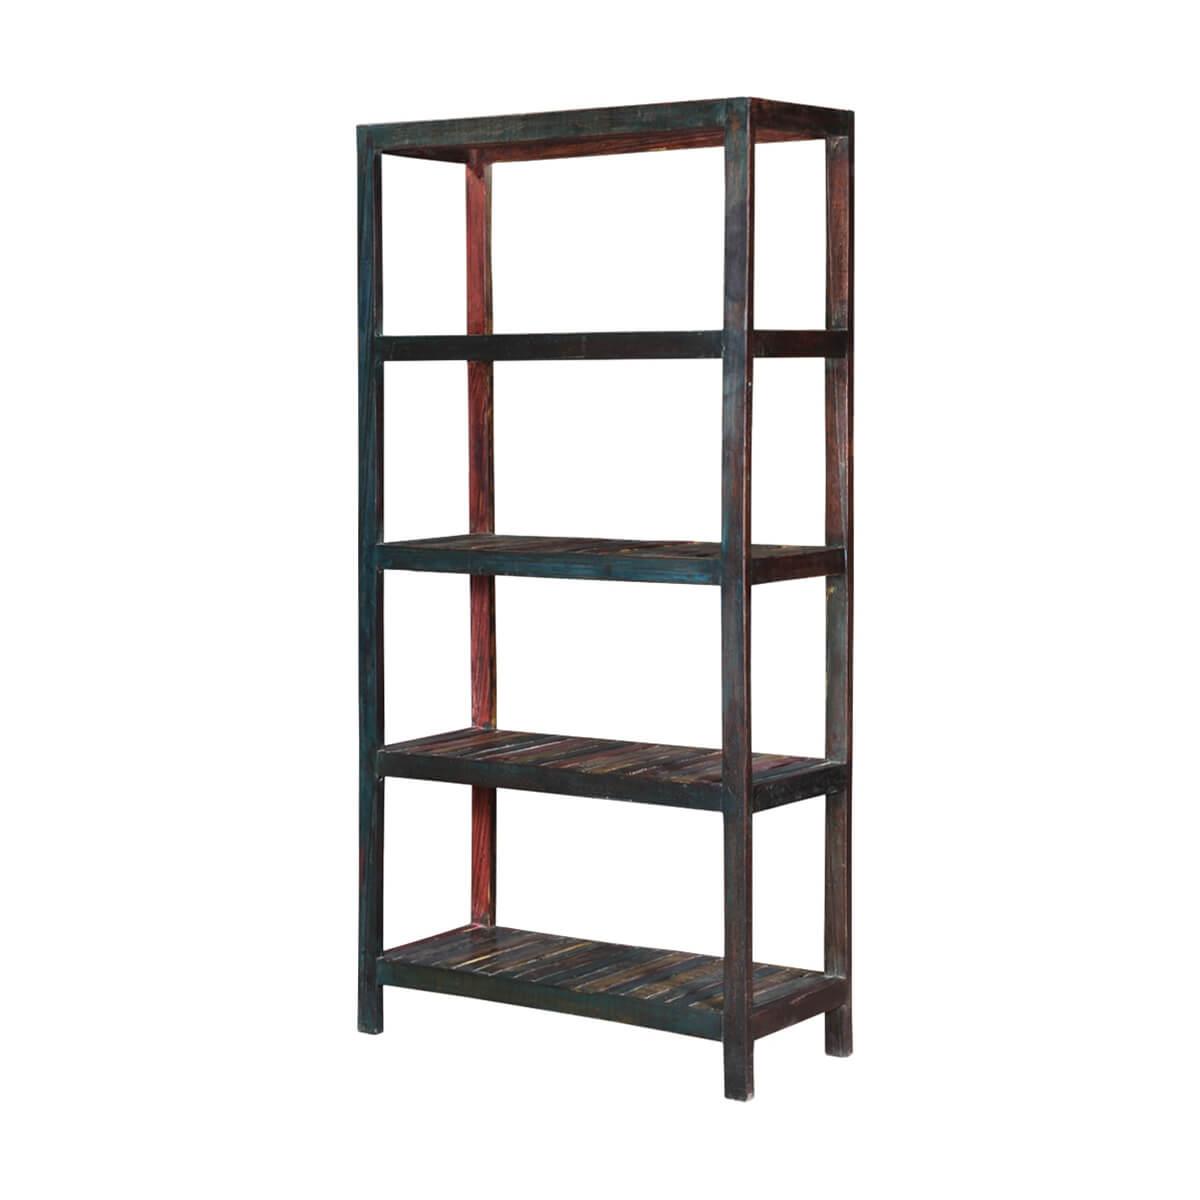 Telluride 4 Open Shelf Rustic Reclaimed Wood Bookcase